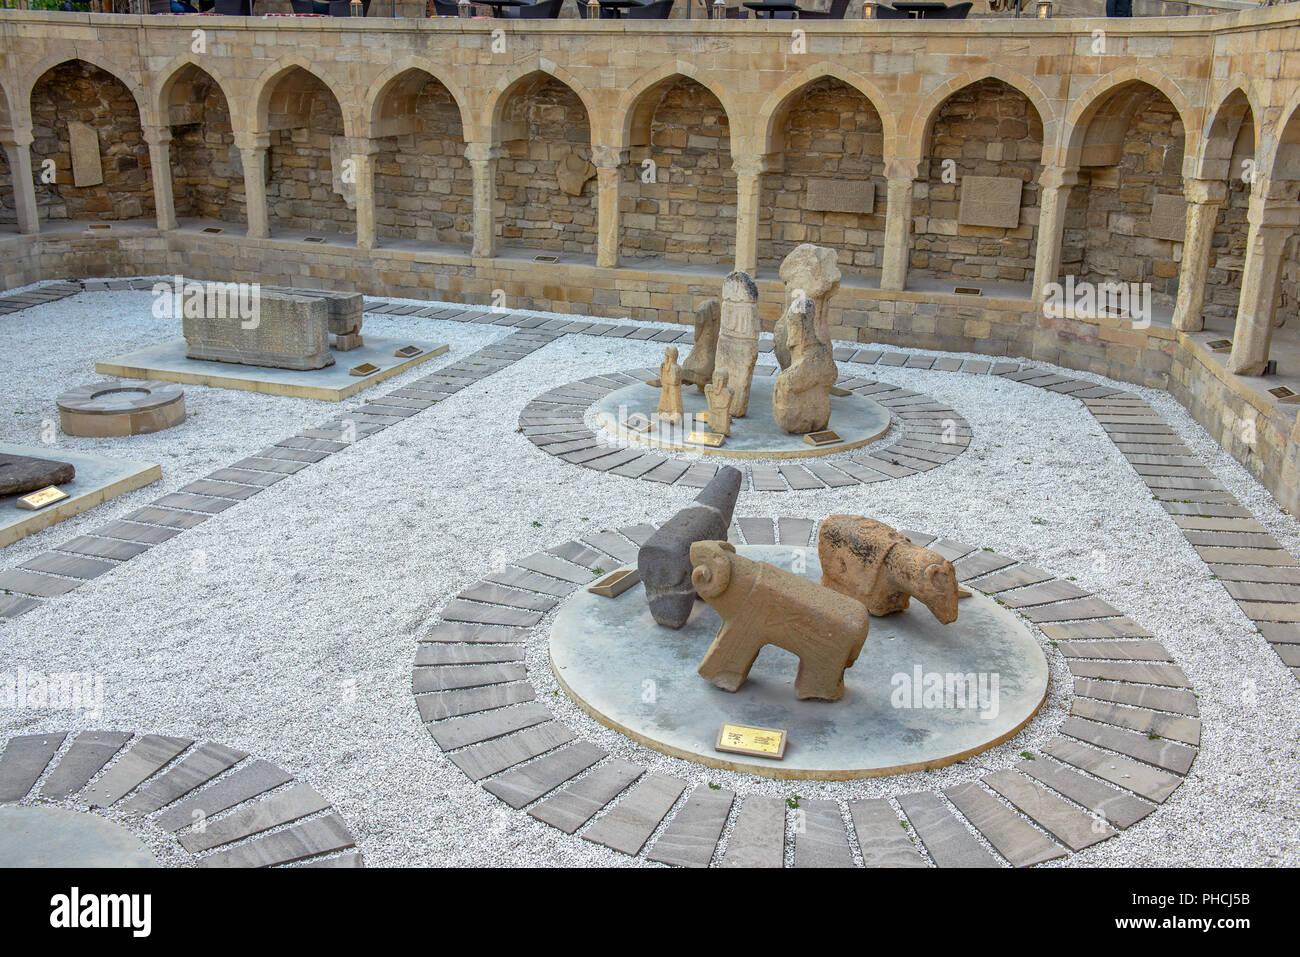 Old city, Baku, Azerbaijan - Stock Image